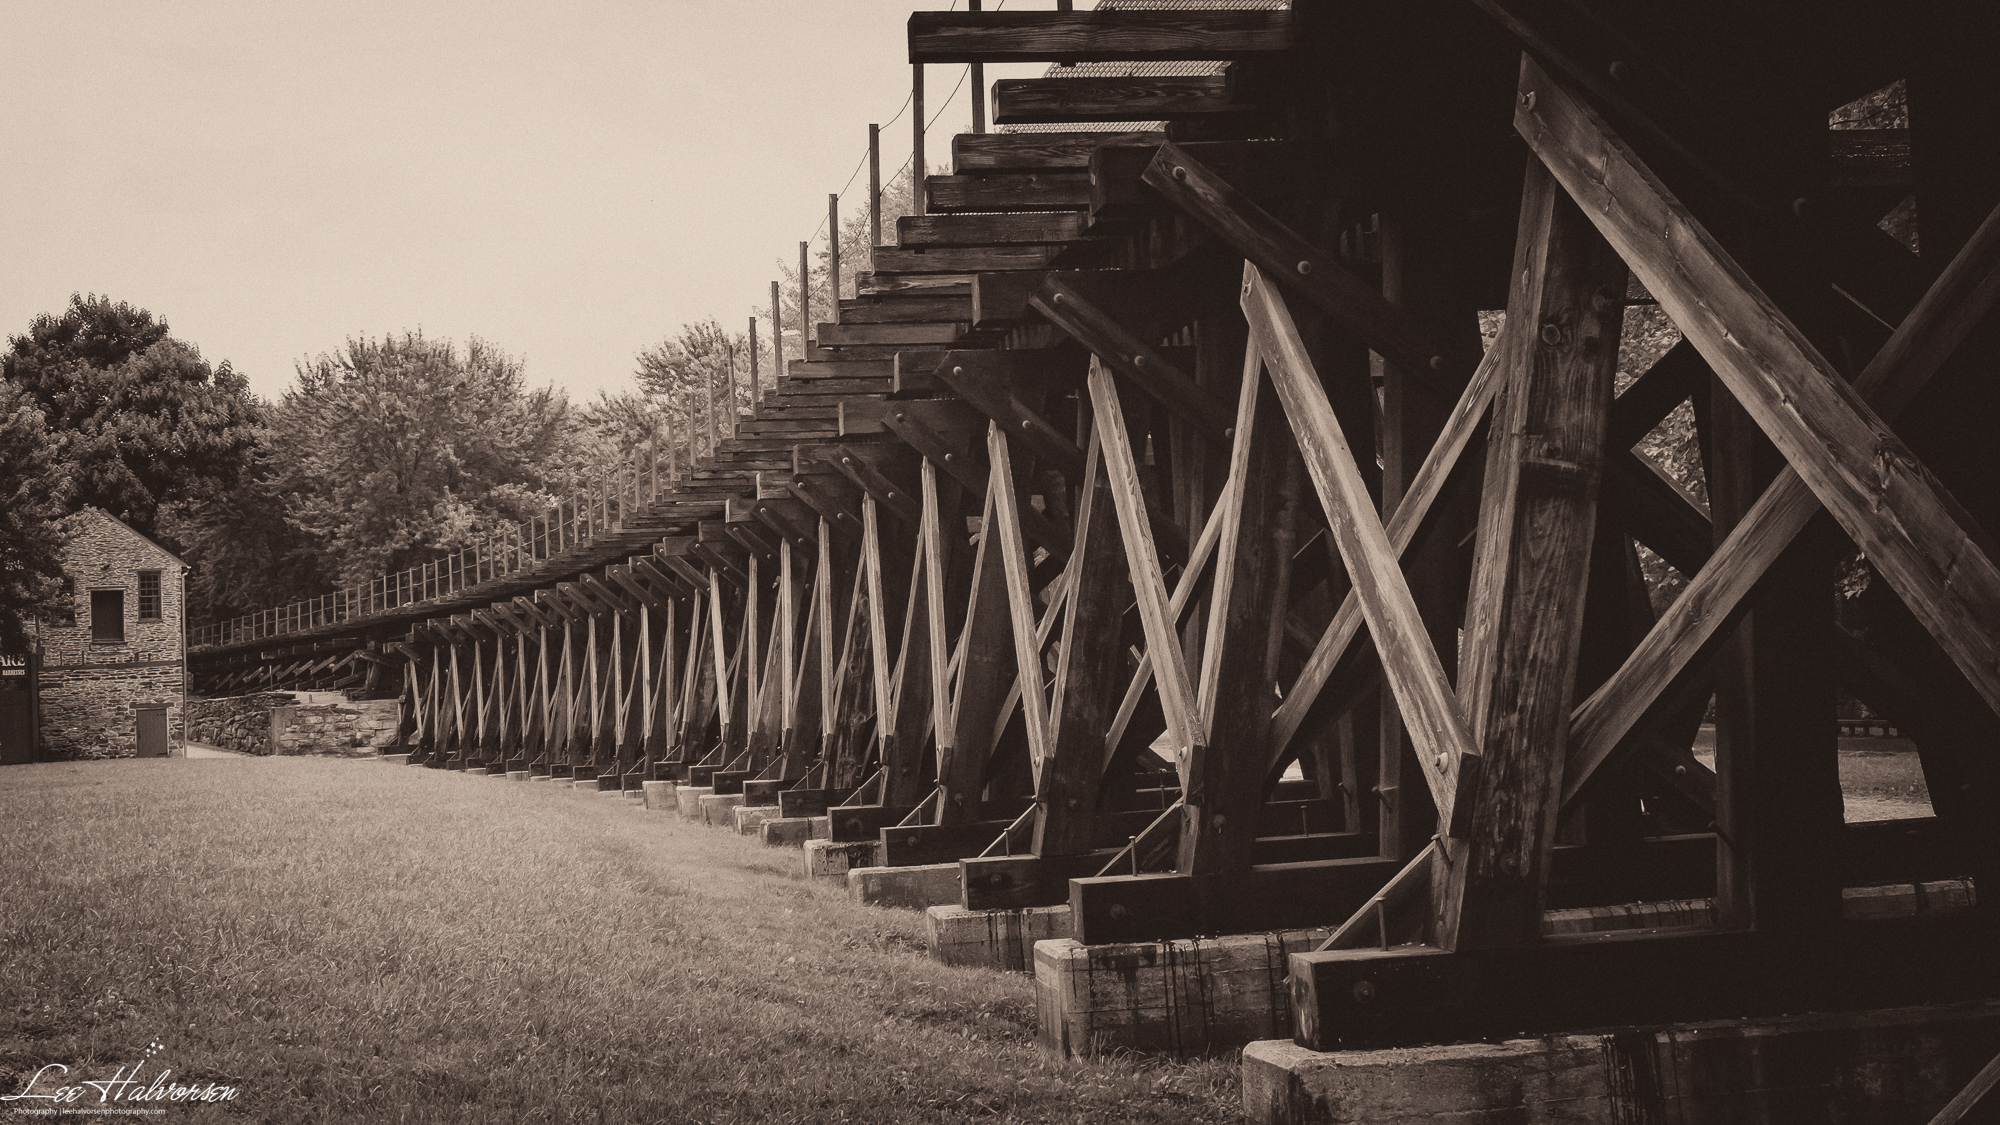 Railroad bed in Harper's Ferry, WV